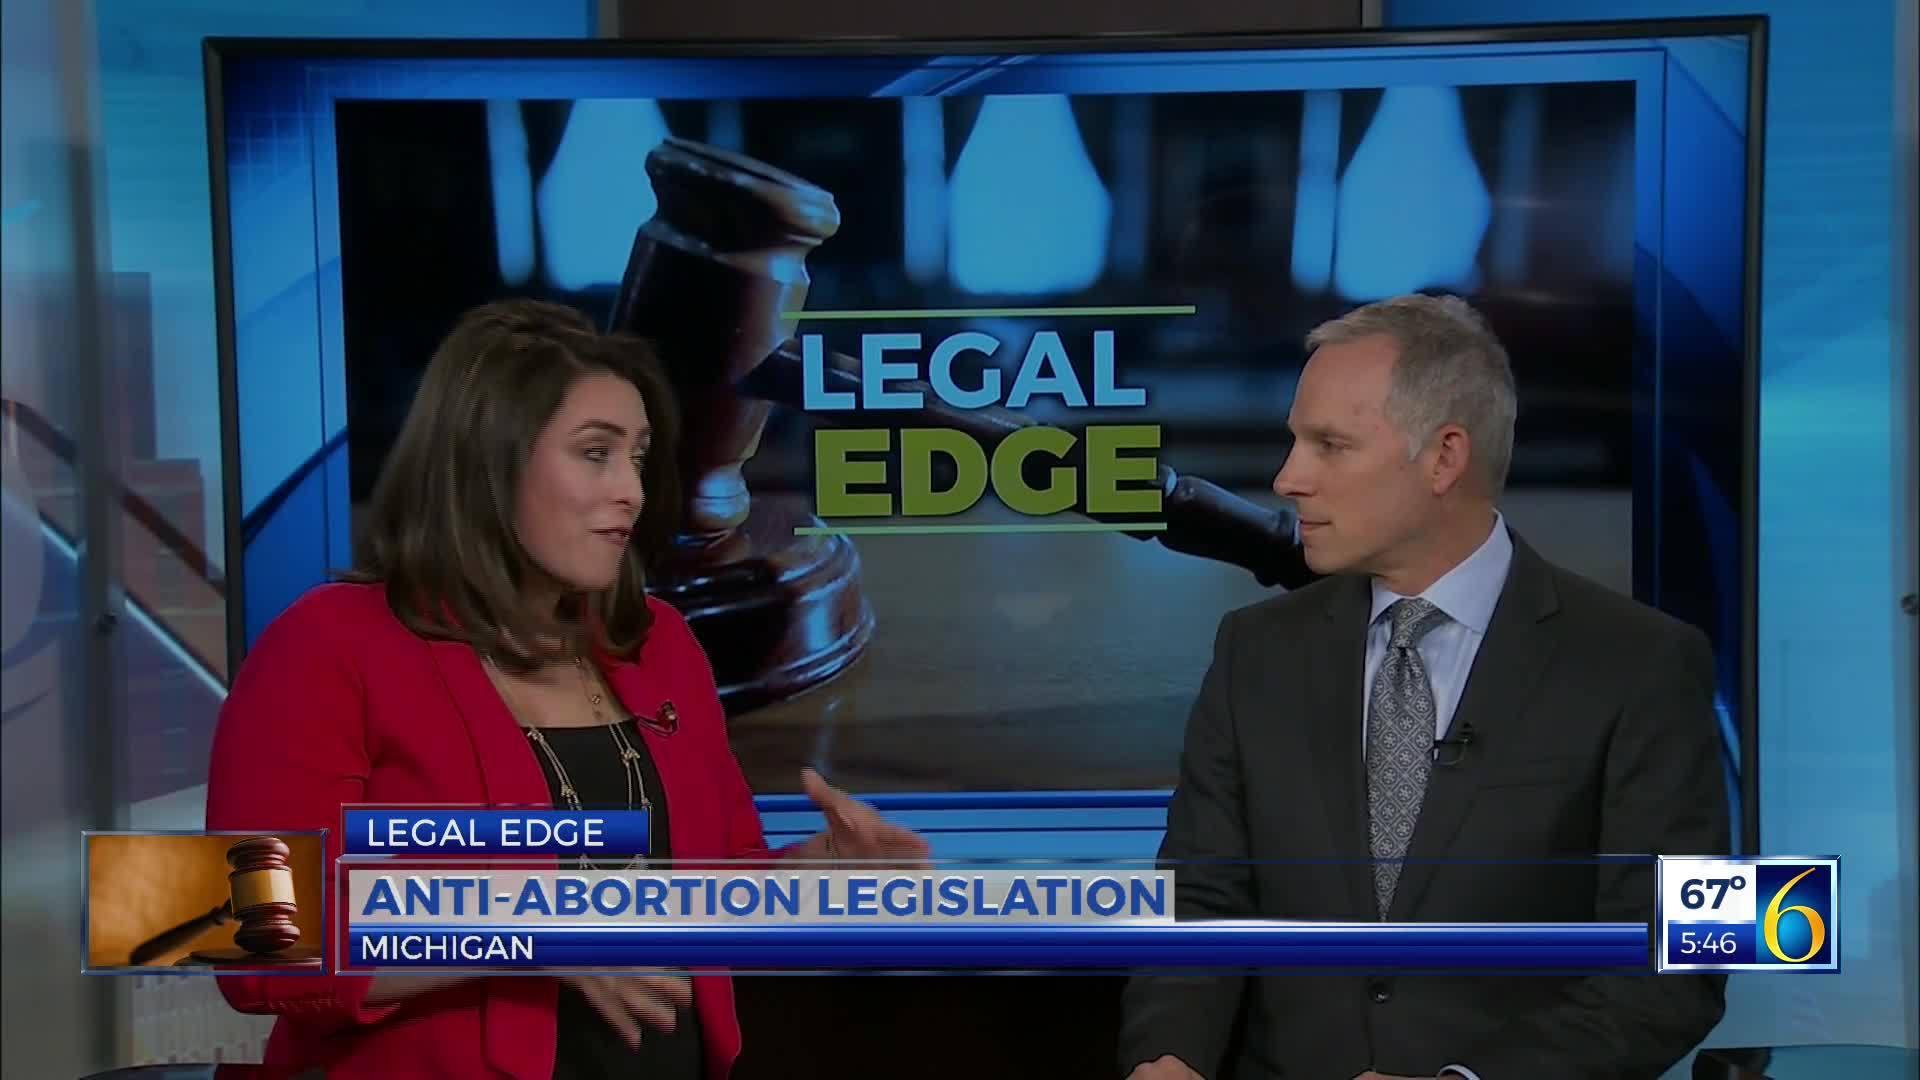 LEGAL EDGE: Understanding Roe v. Wade